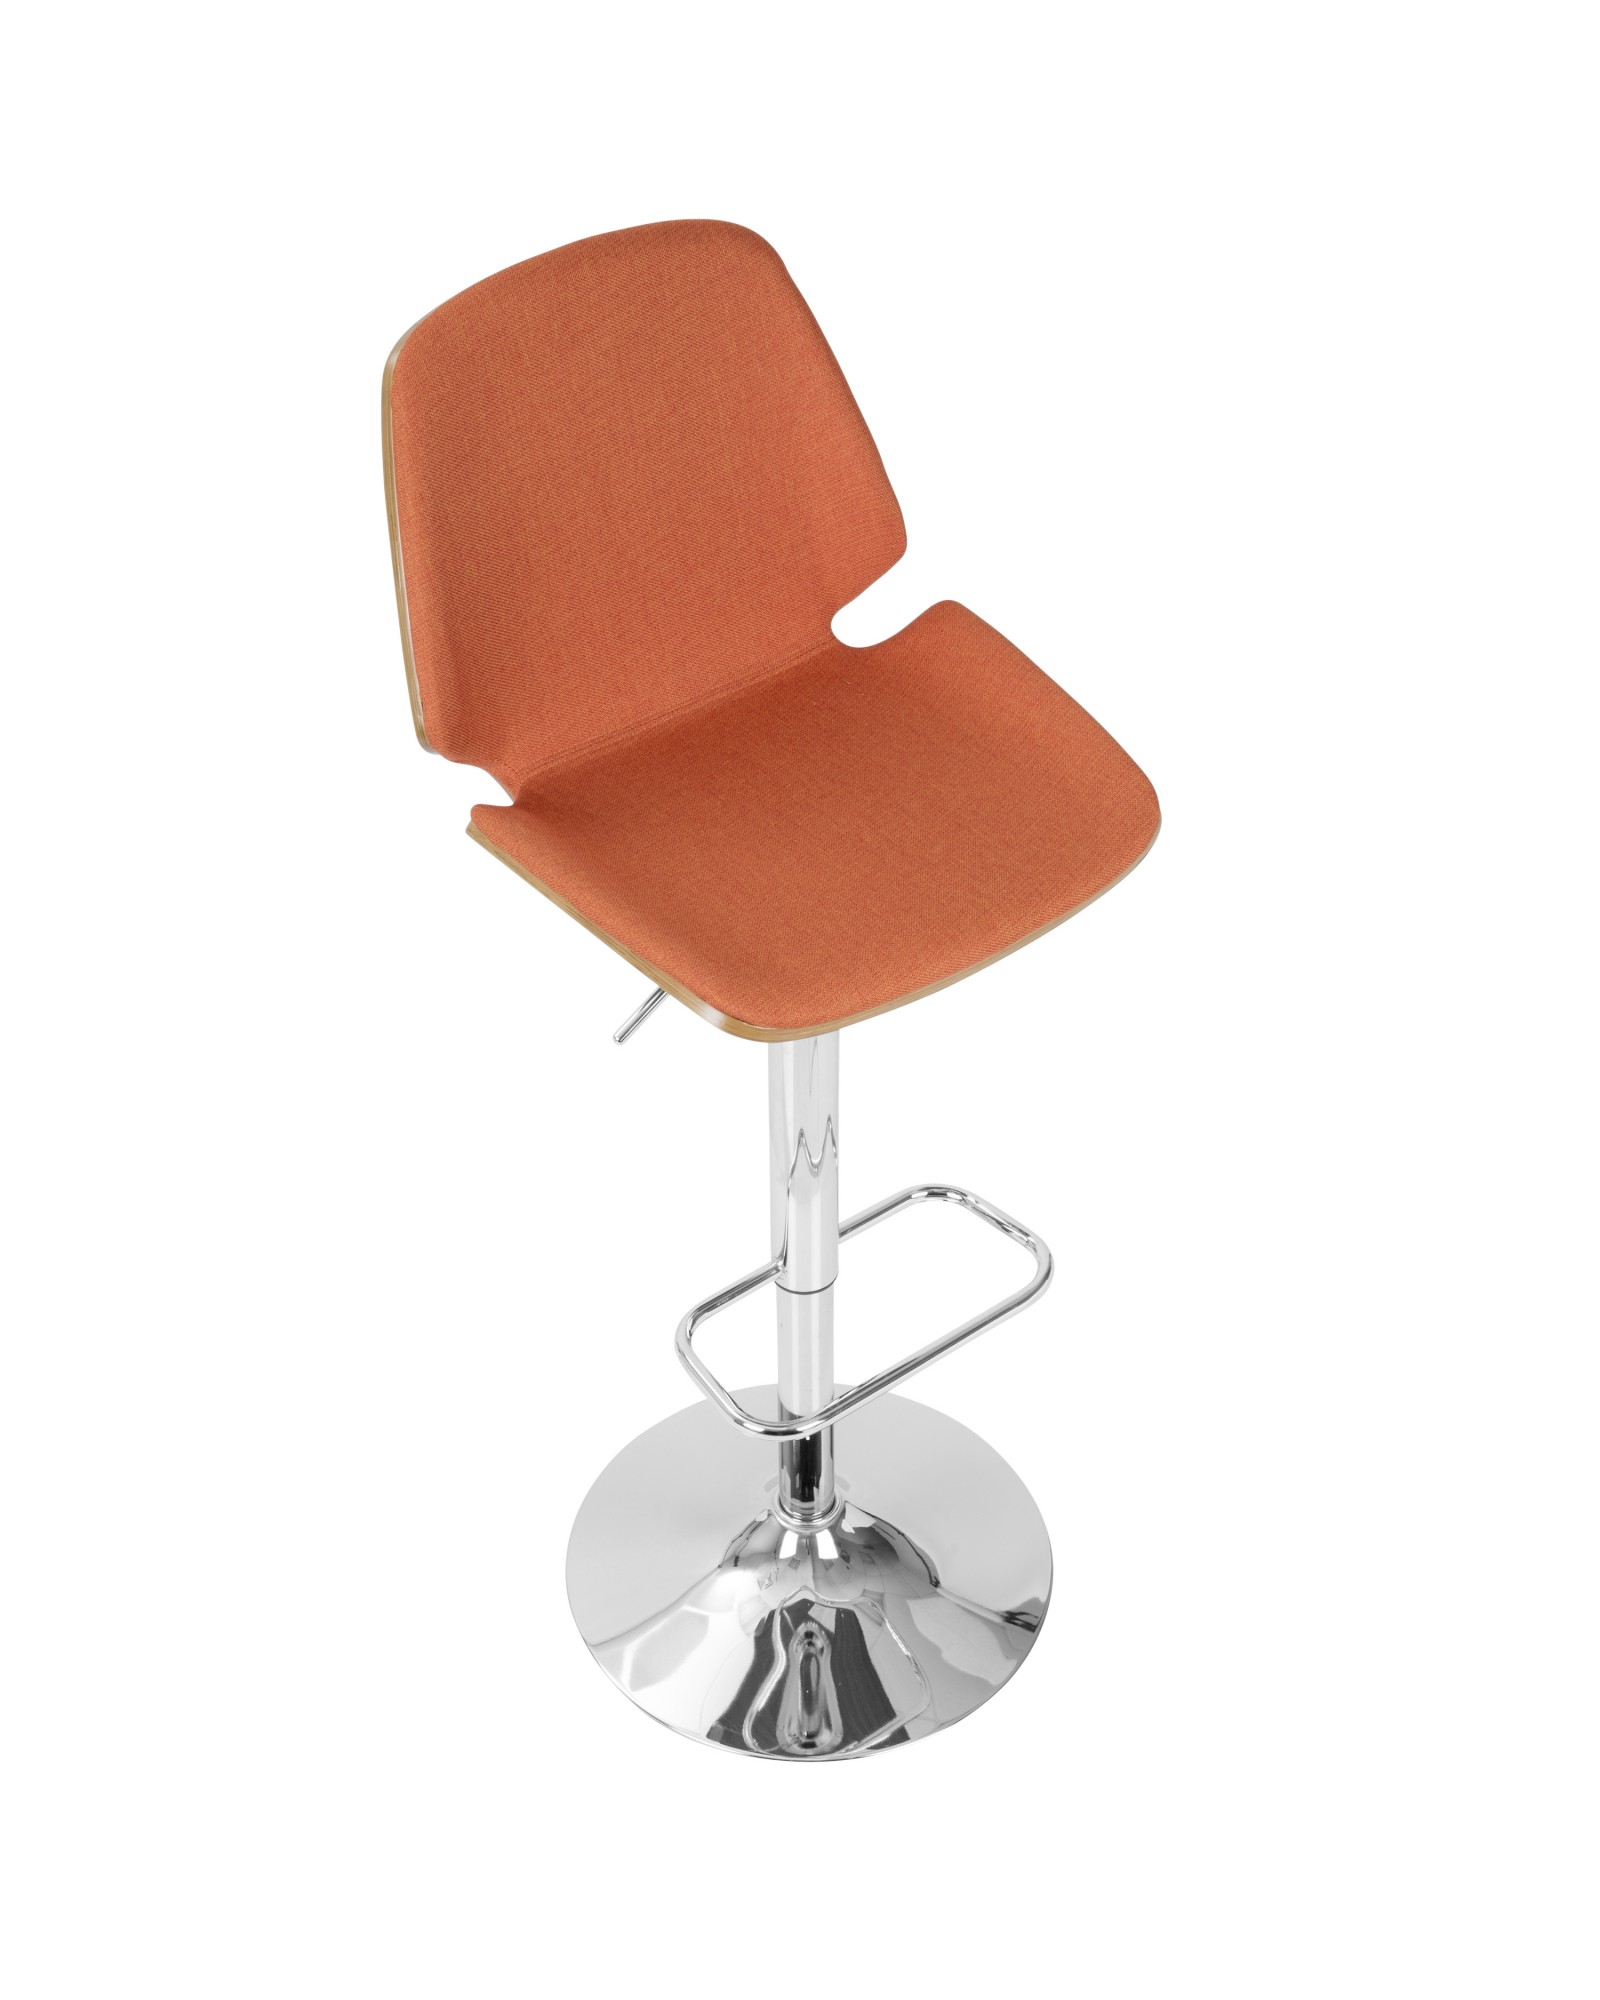 Serena Mid-Century Modern Barstool in Walnut and Orange